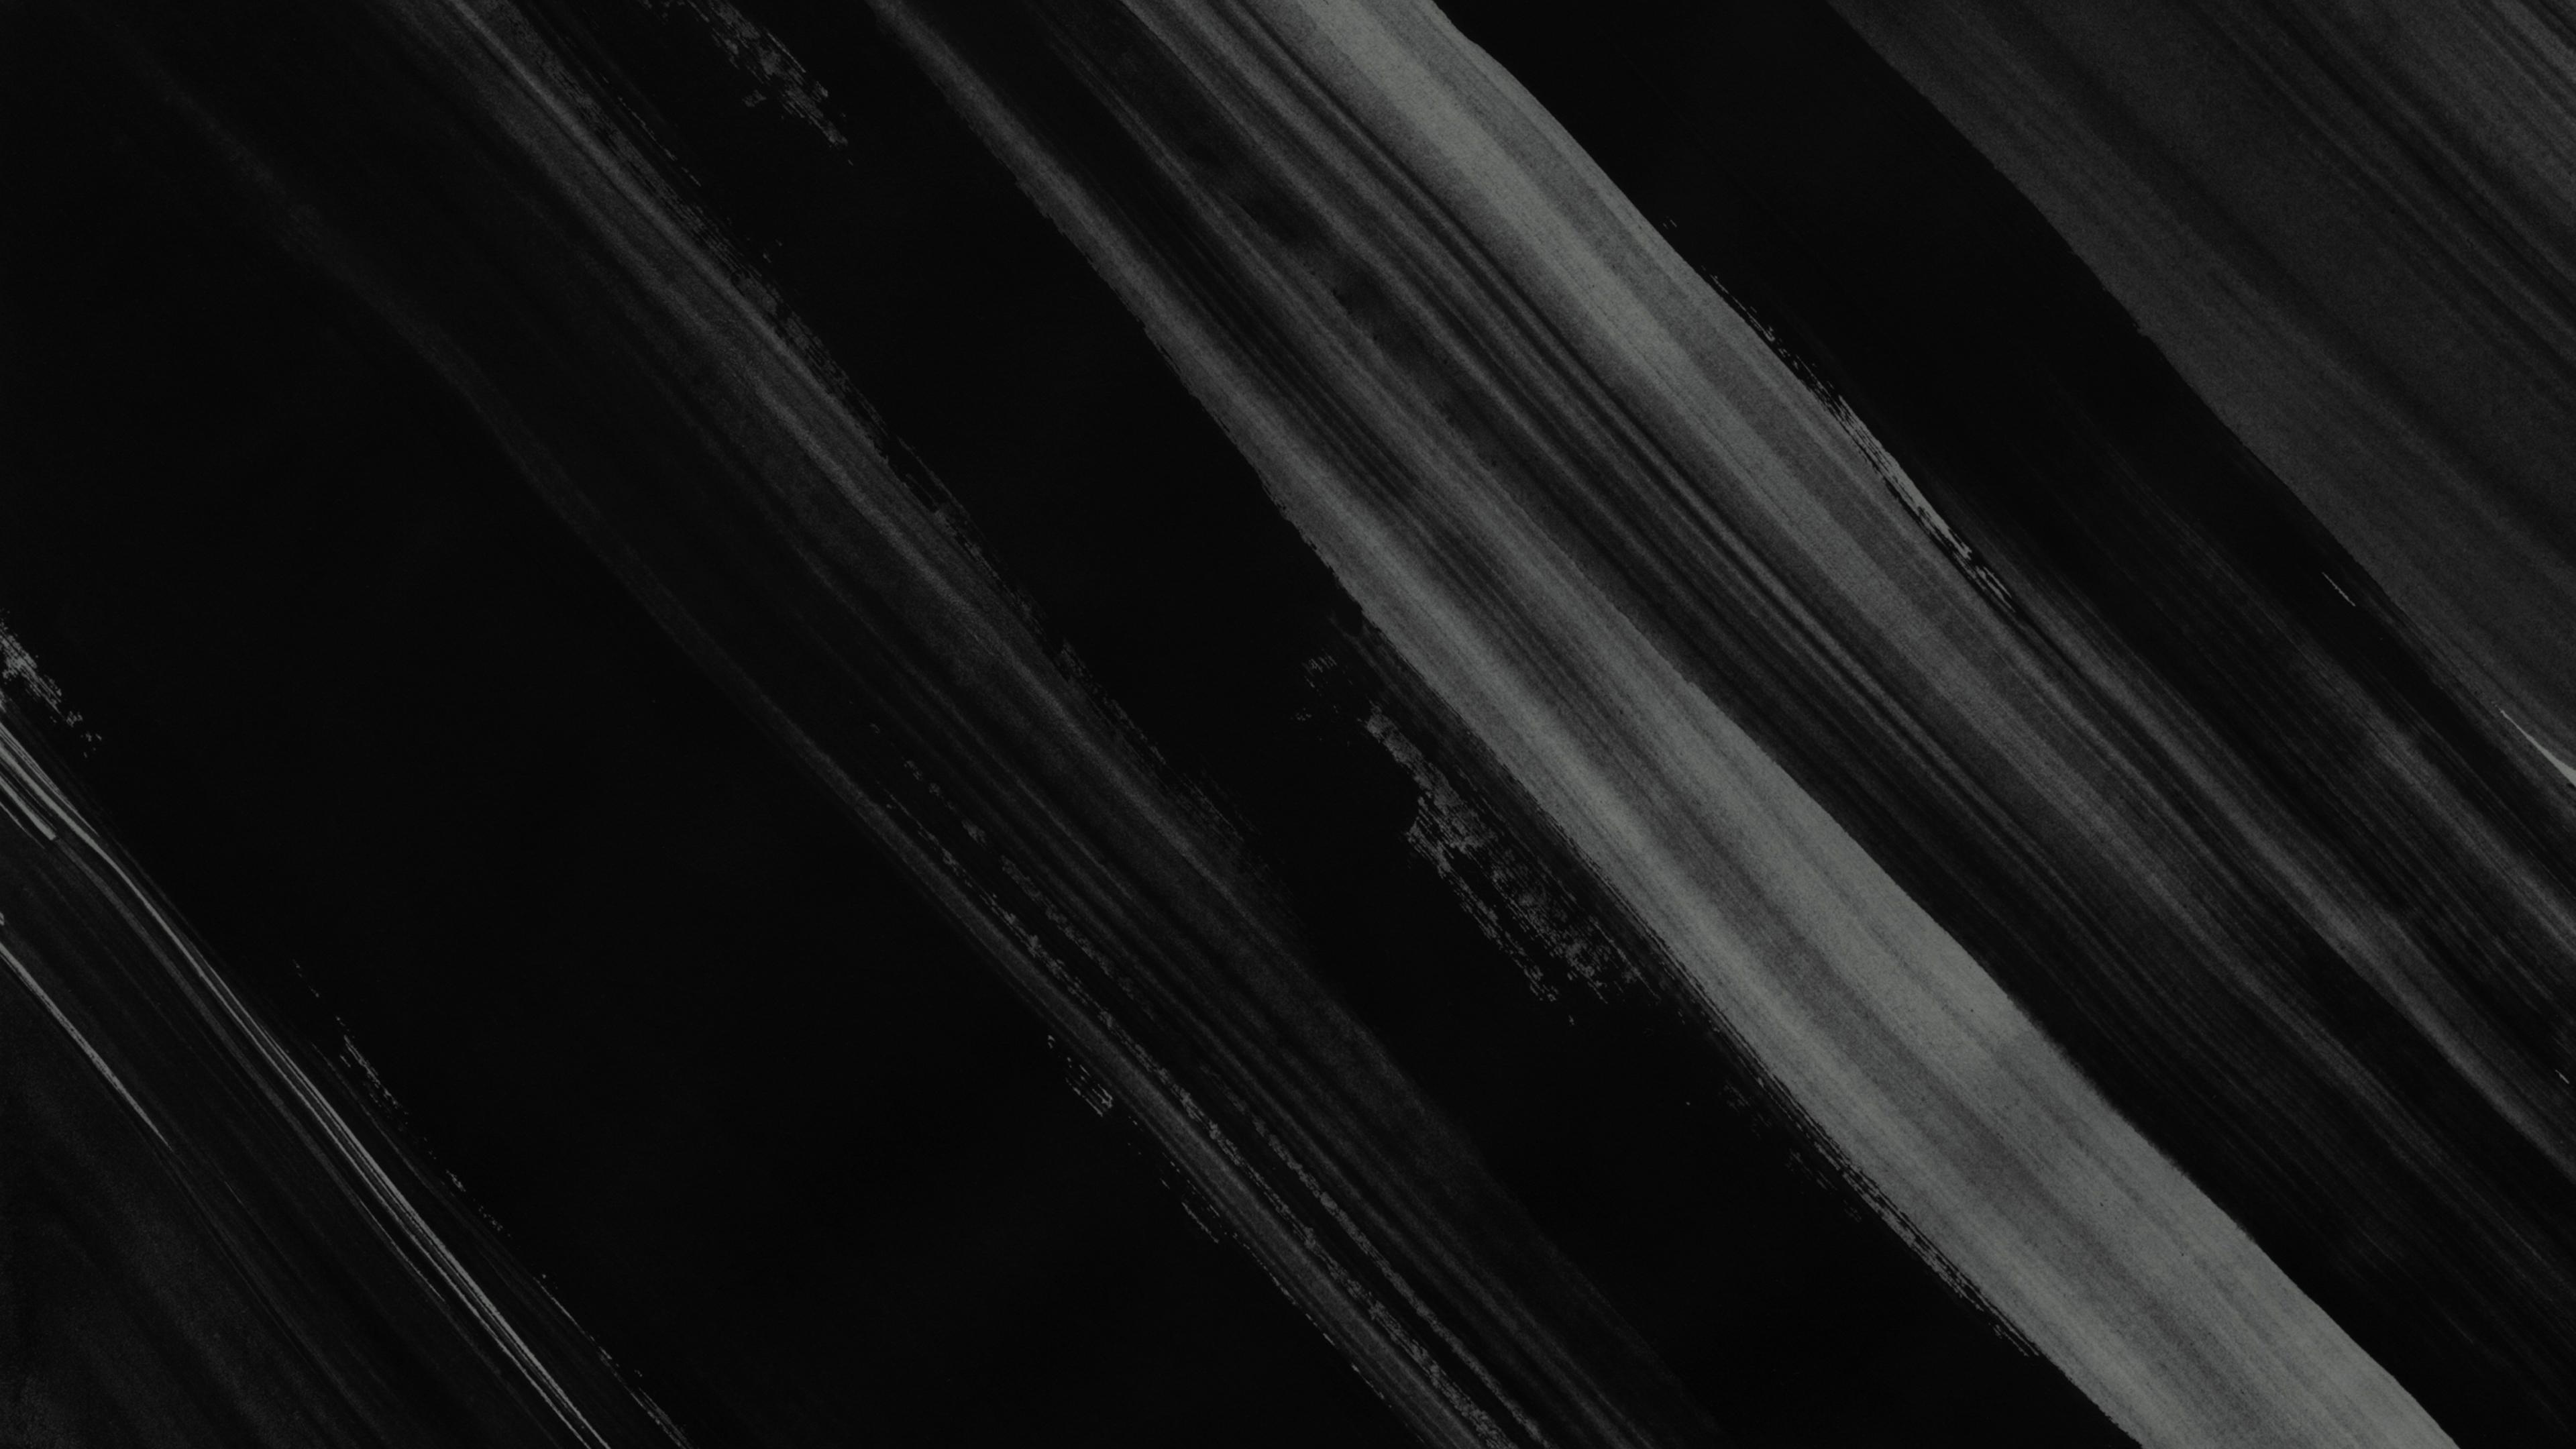 4k Black Wallpapers - Wallpaper Cave